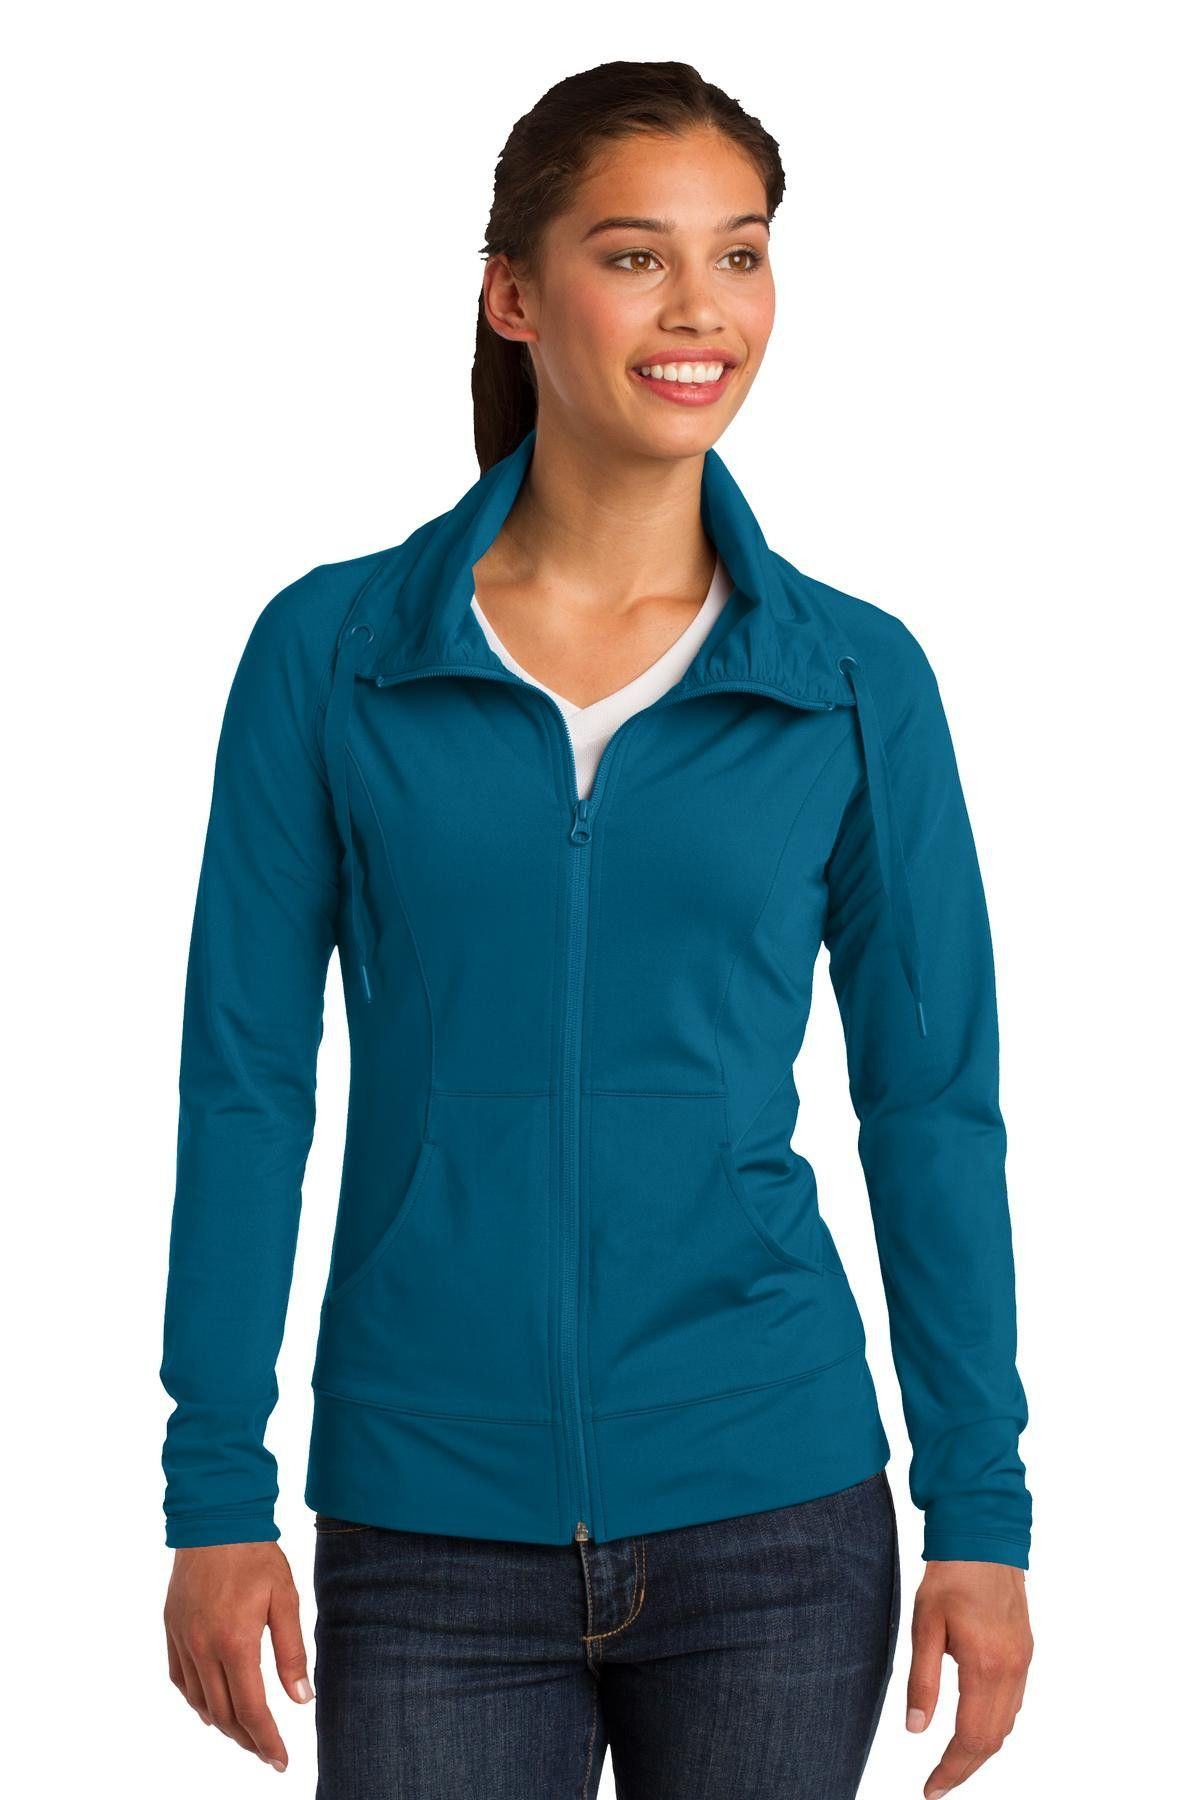 SportTek Ladies SportWick Stretch FullZip Jacket